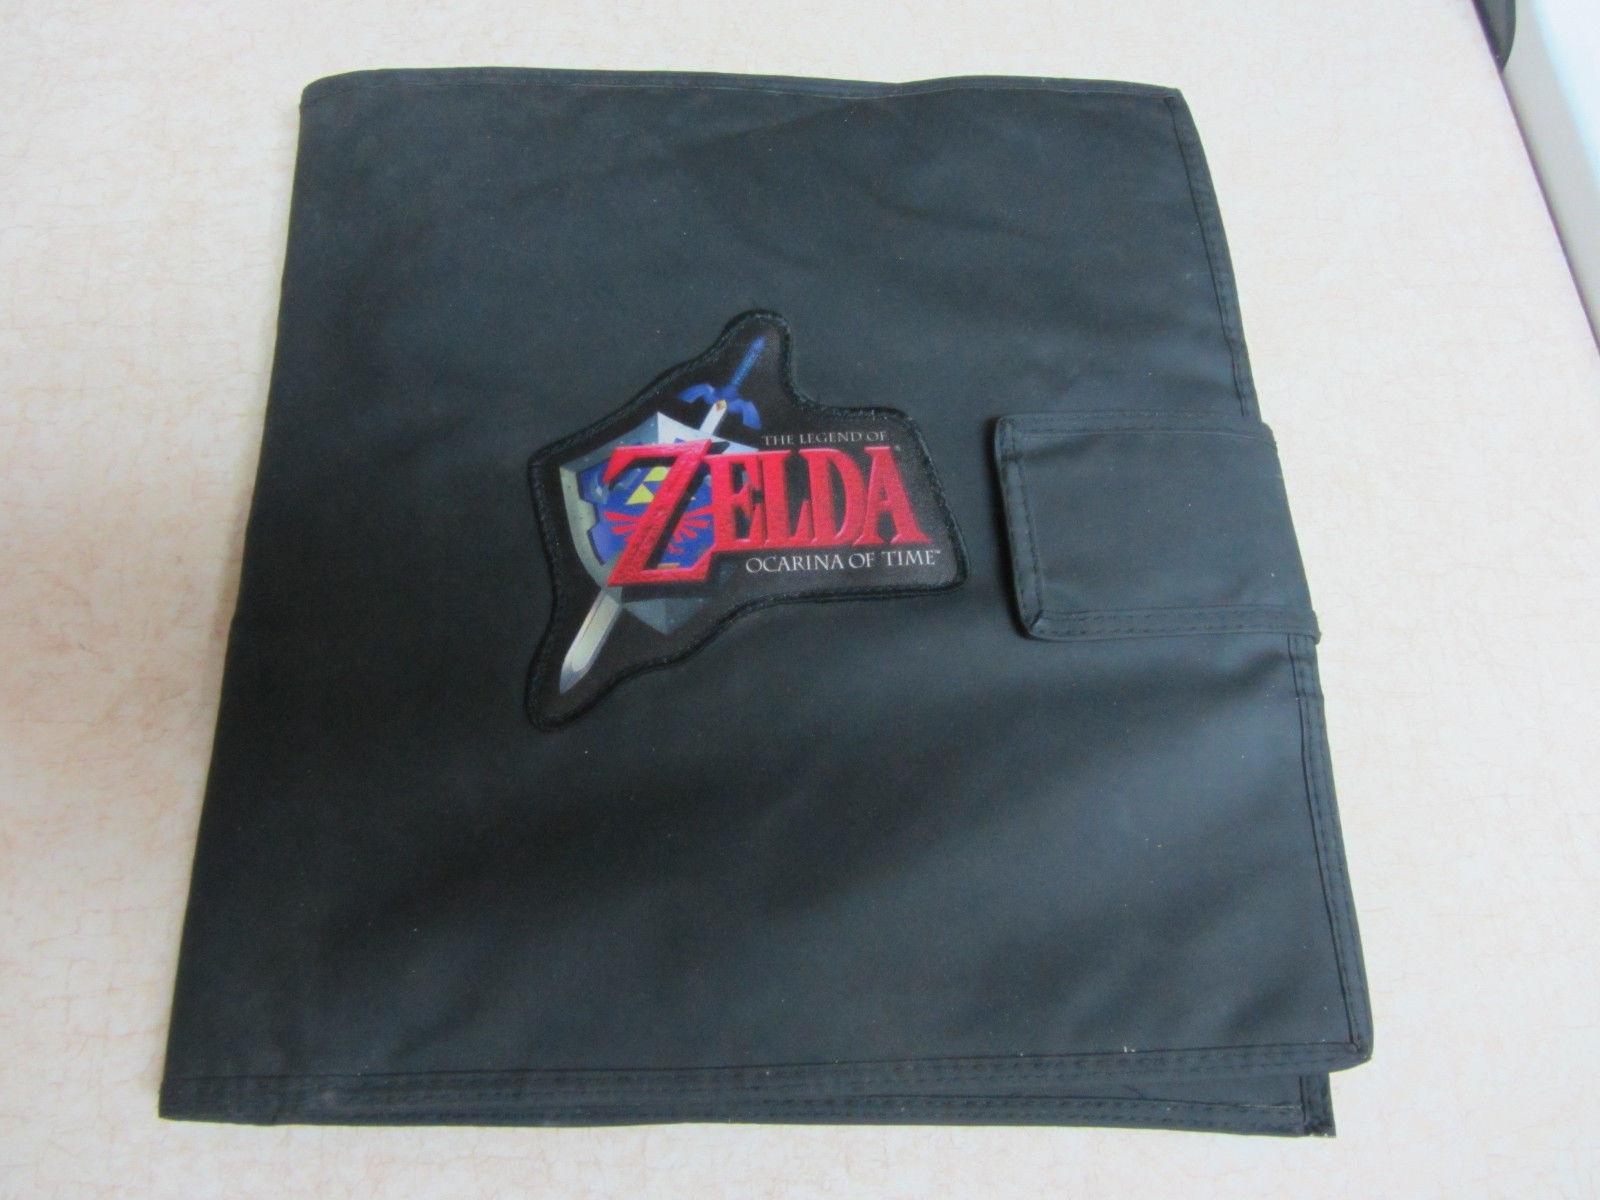 d0292db3d The Legend Of Zelda Ocarina of Time School and 26 similar items